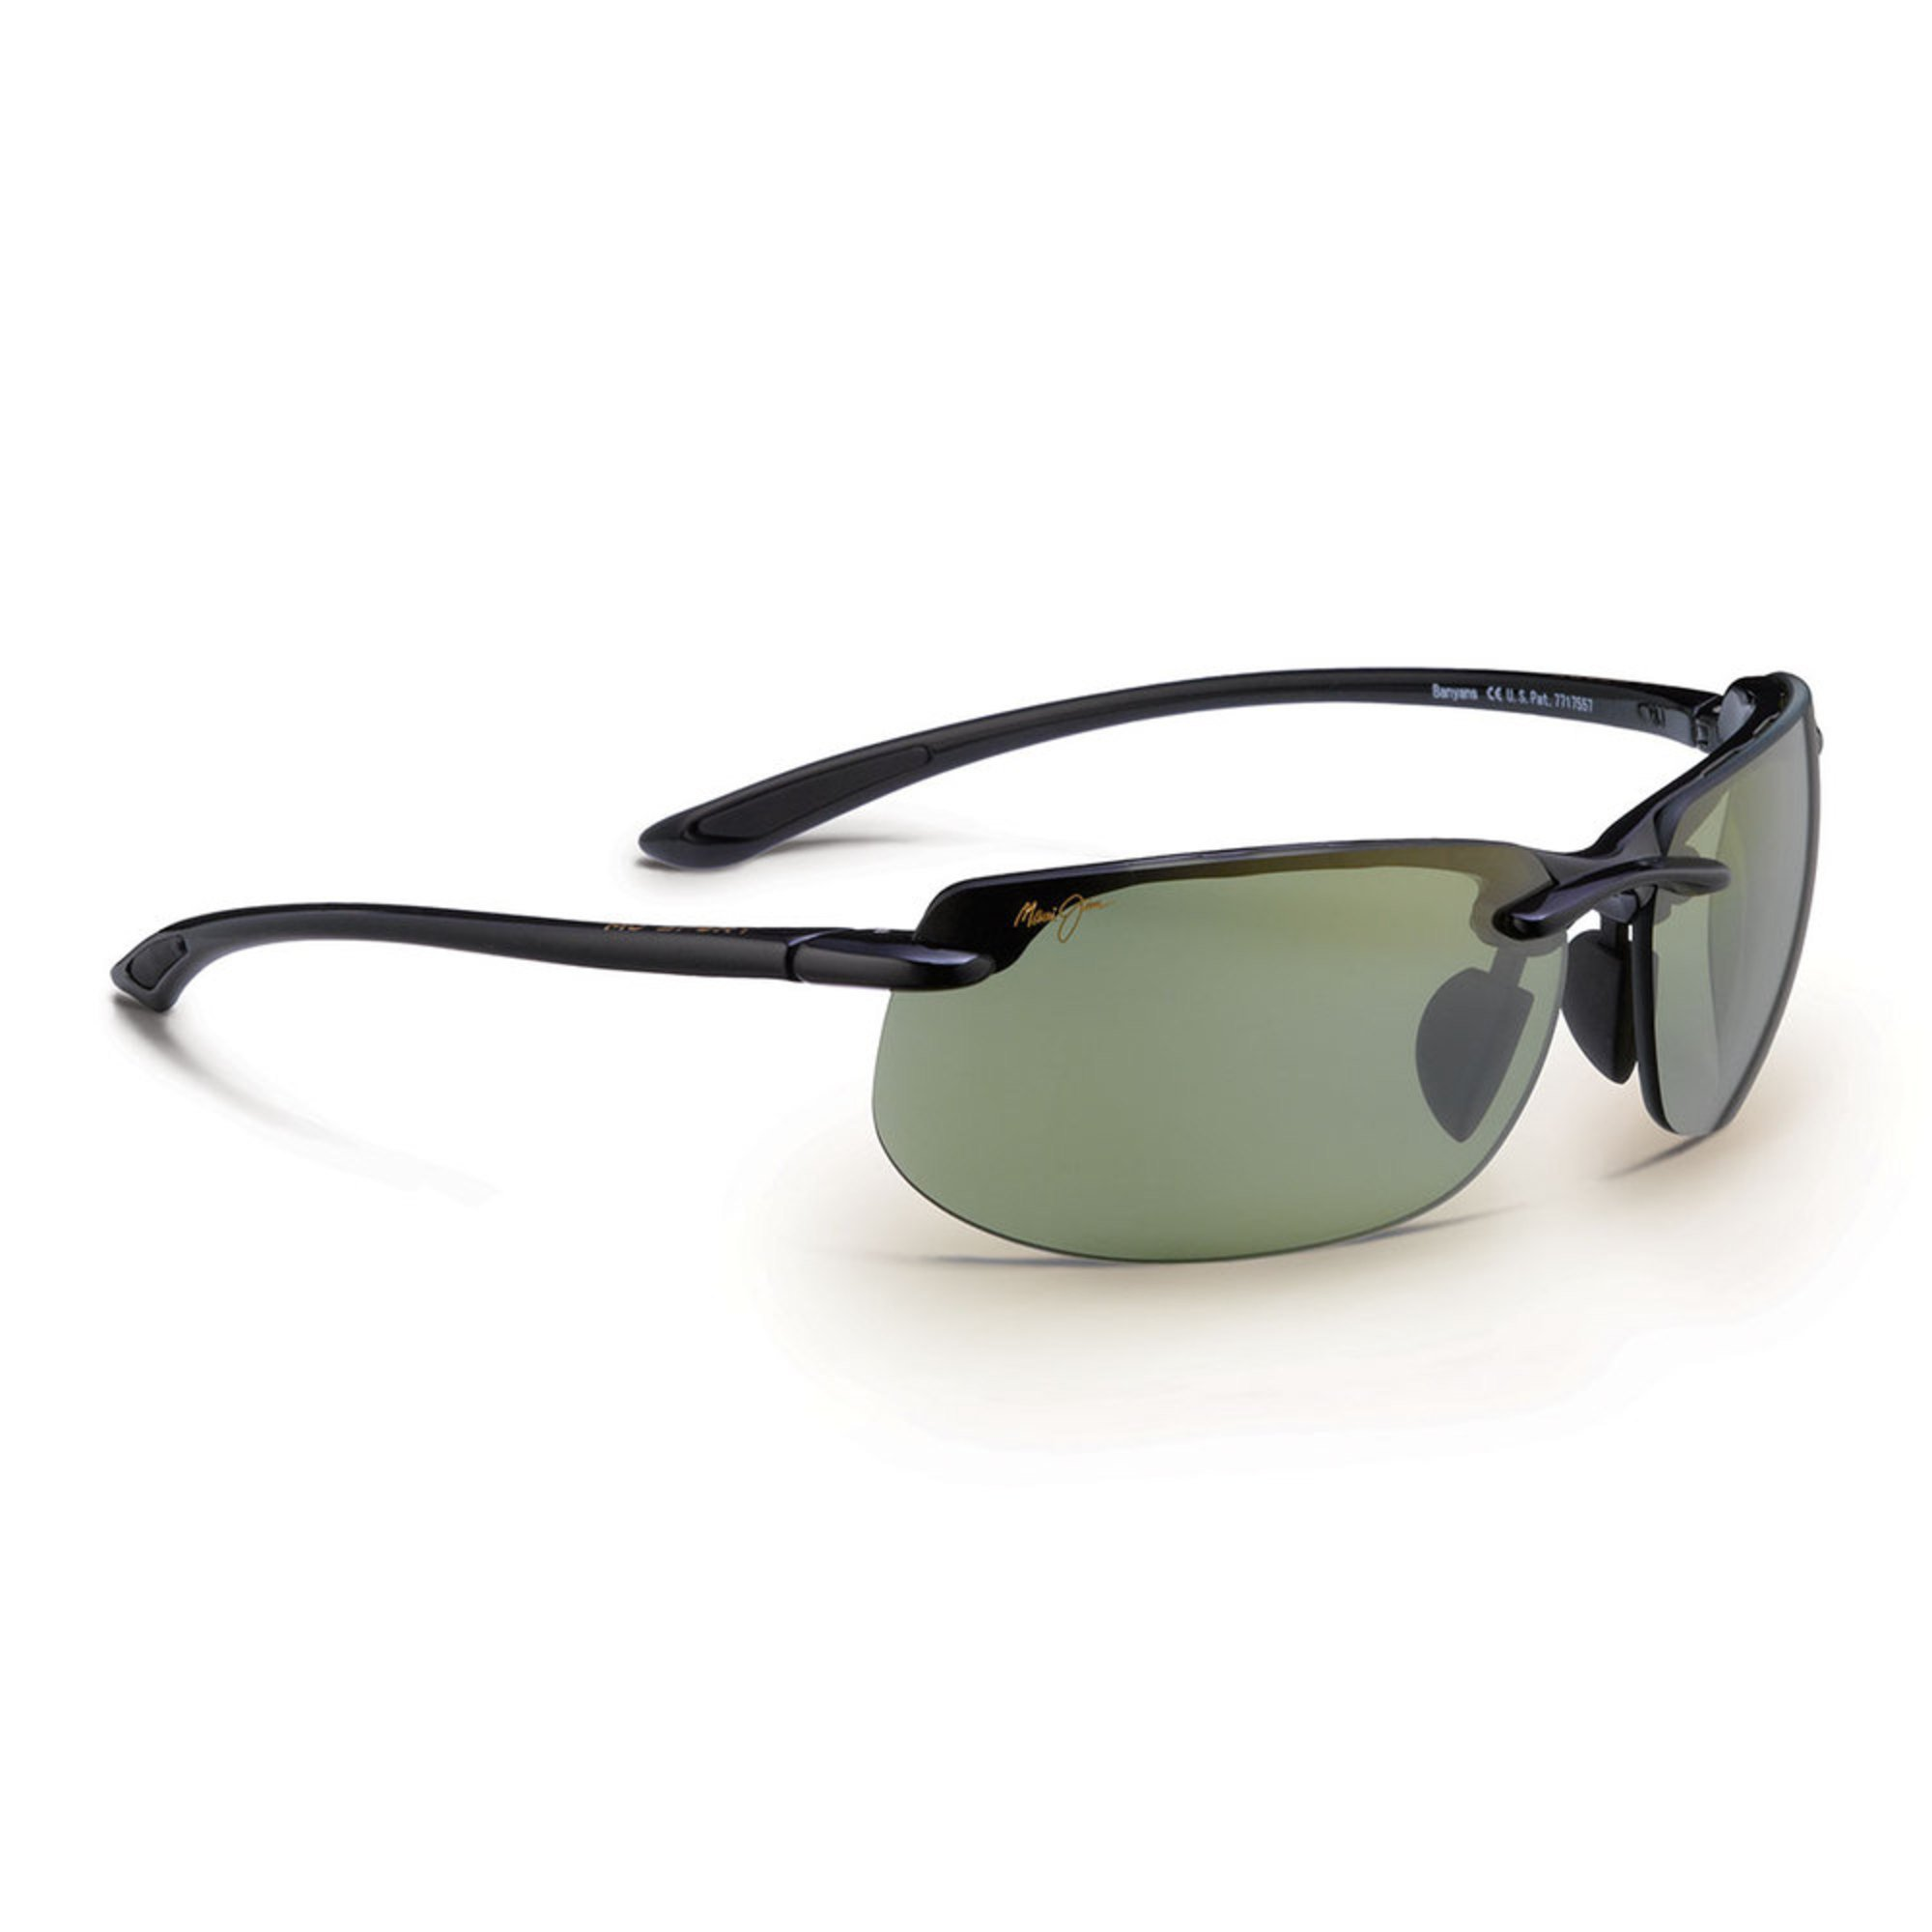 209770ea39d8 Maui Jim Men's Banyans Gloss Black Rimless Sunglasses | Unisex ...